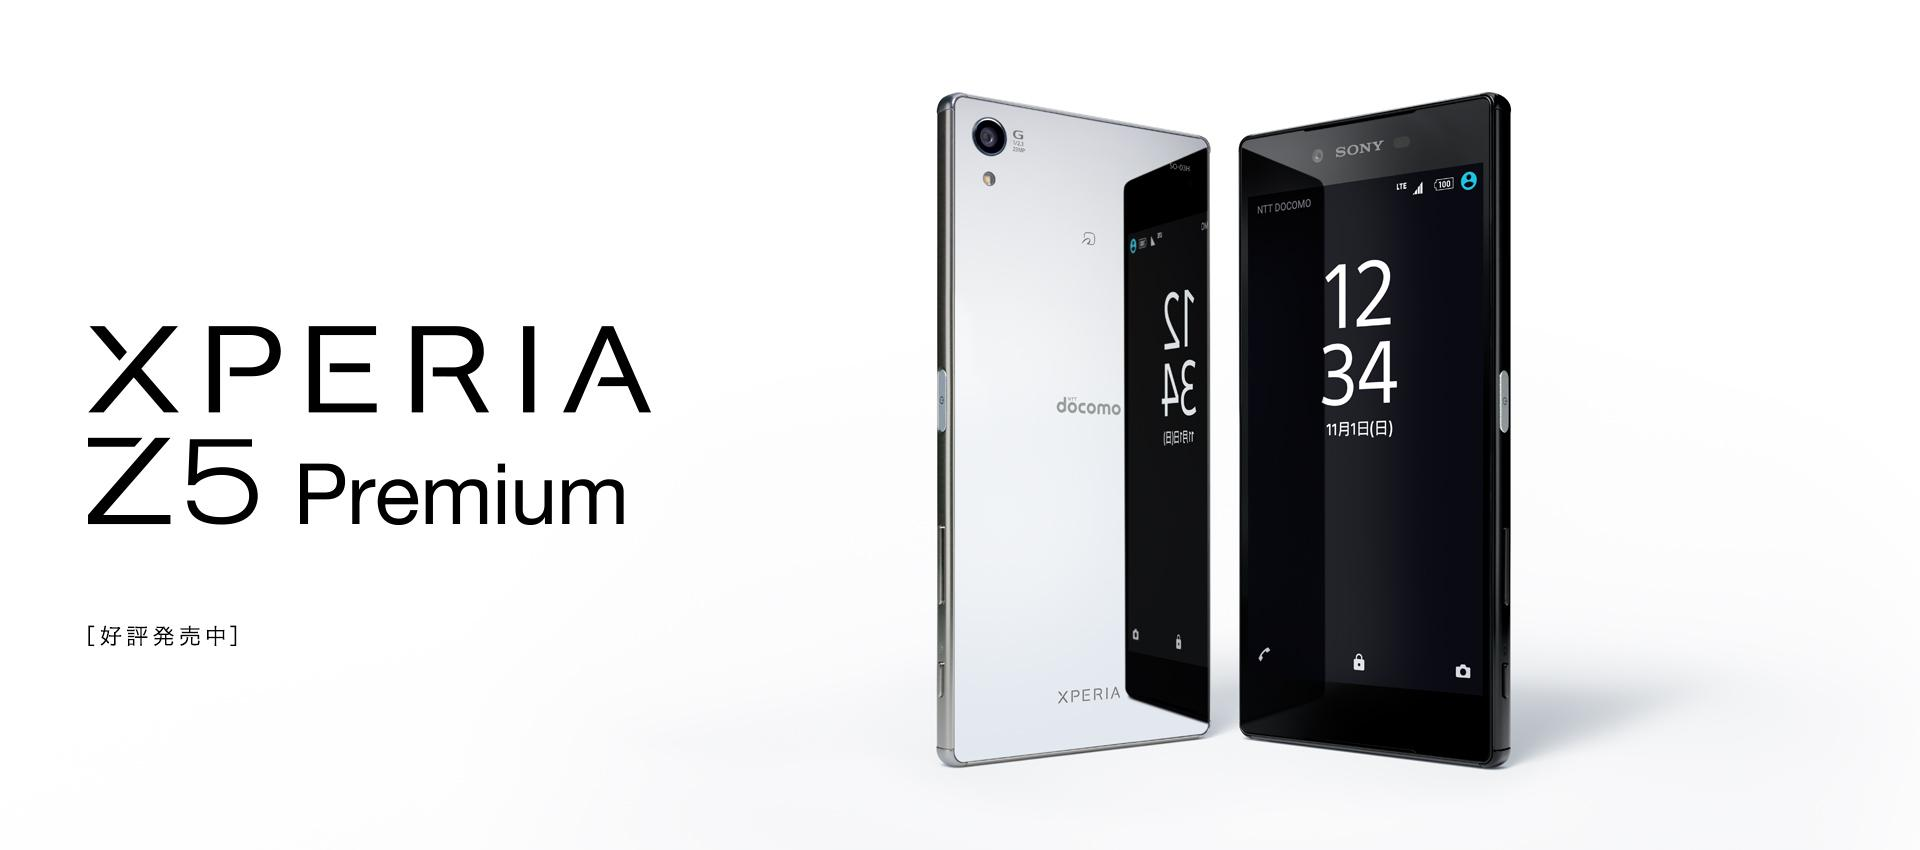 ... Dual Resmi 32GB Aqua Green Daftar Source · Sony Xperia Z5 PREMIUM